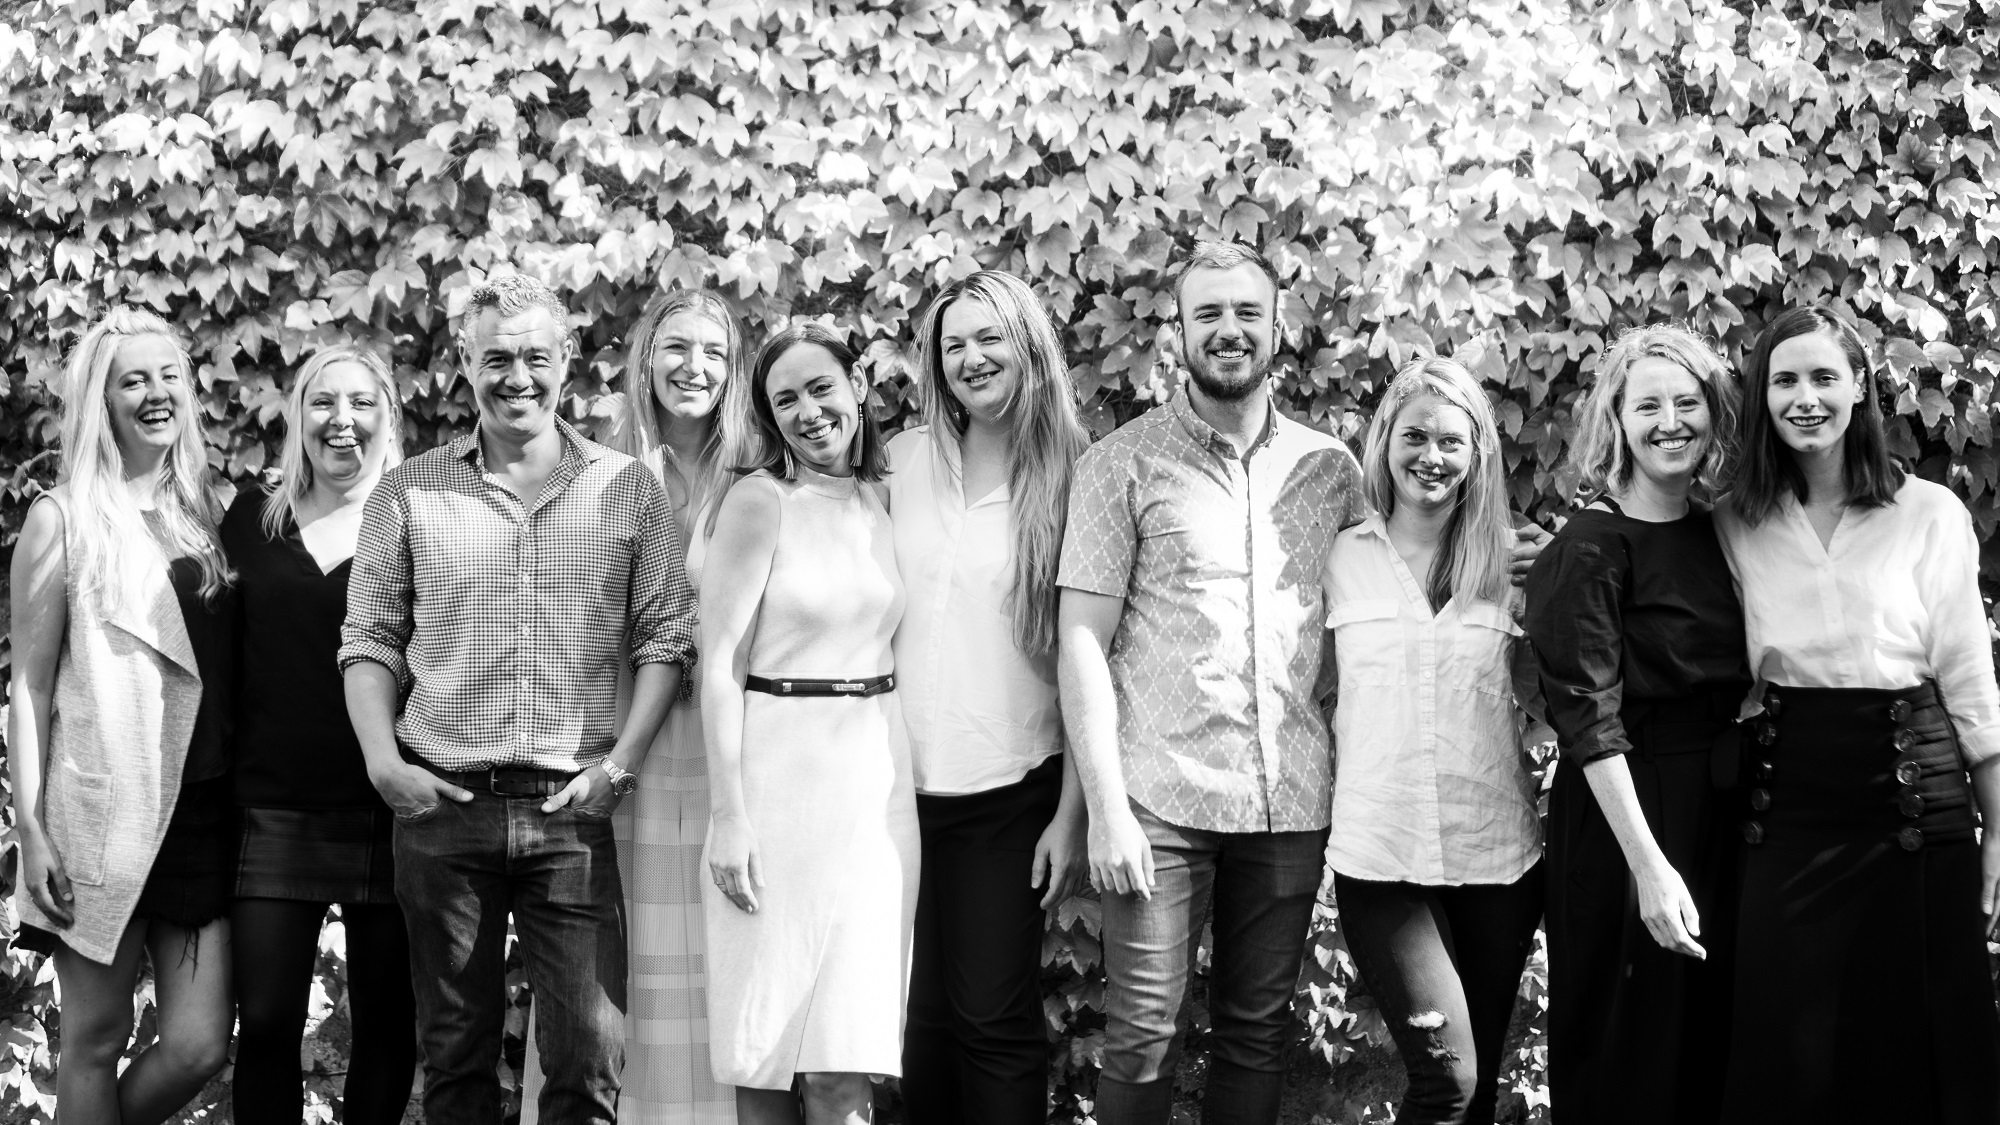 McCann Sydney's integrated team